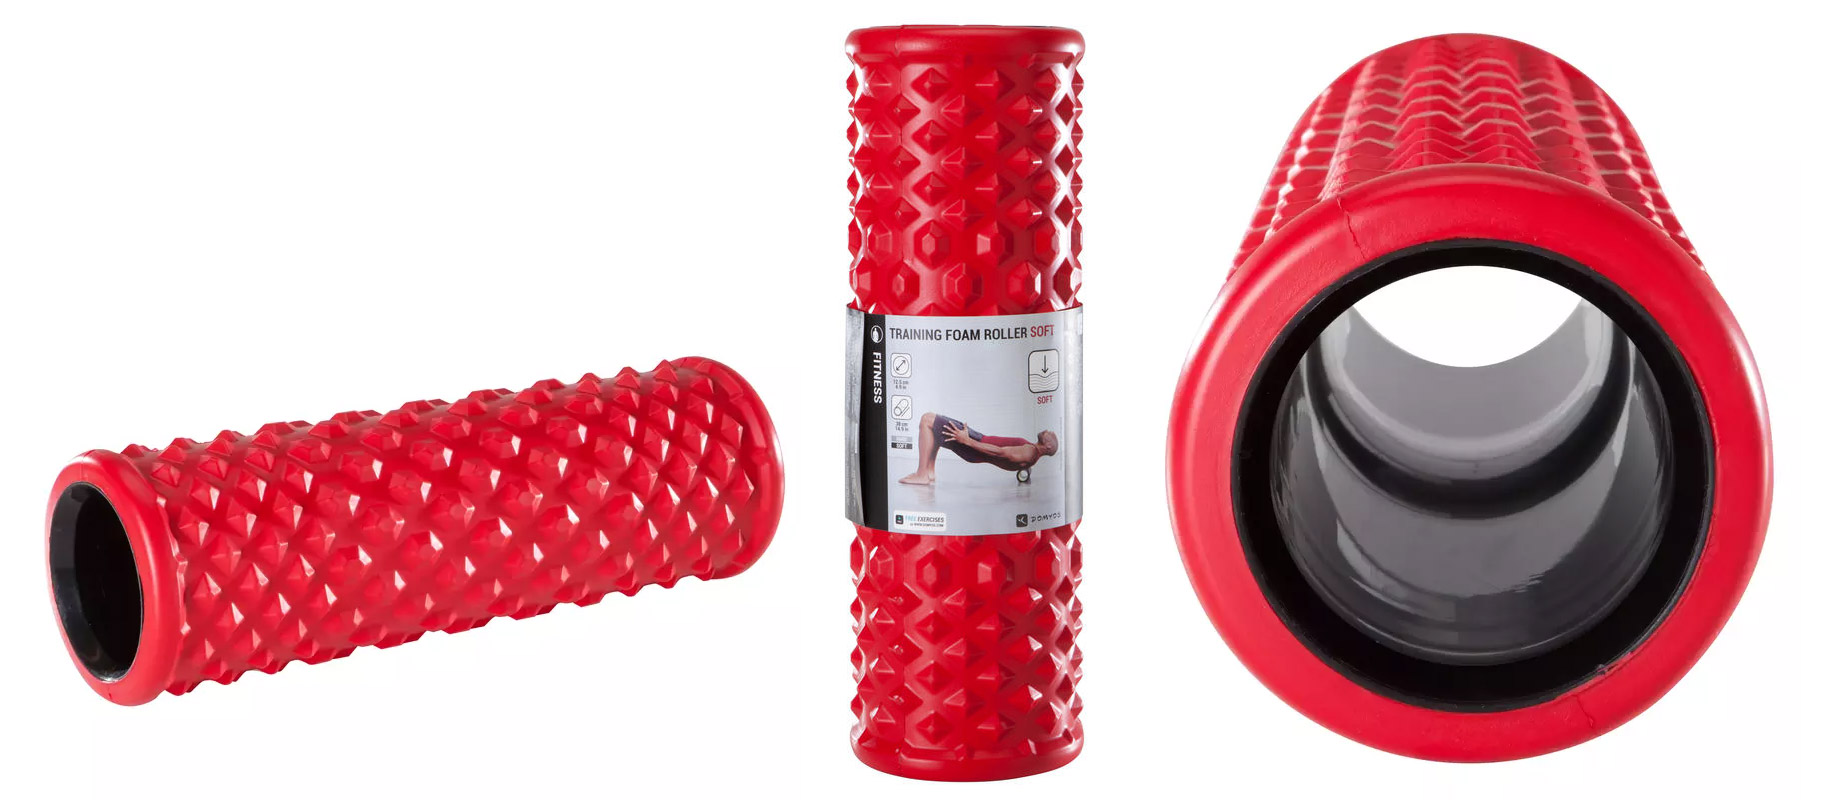 decathlon foam roller